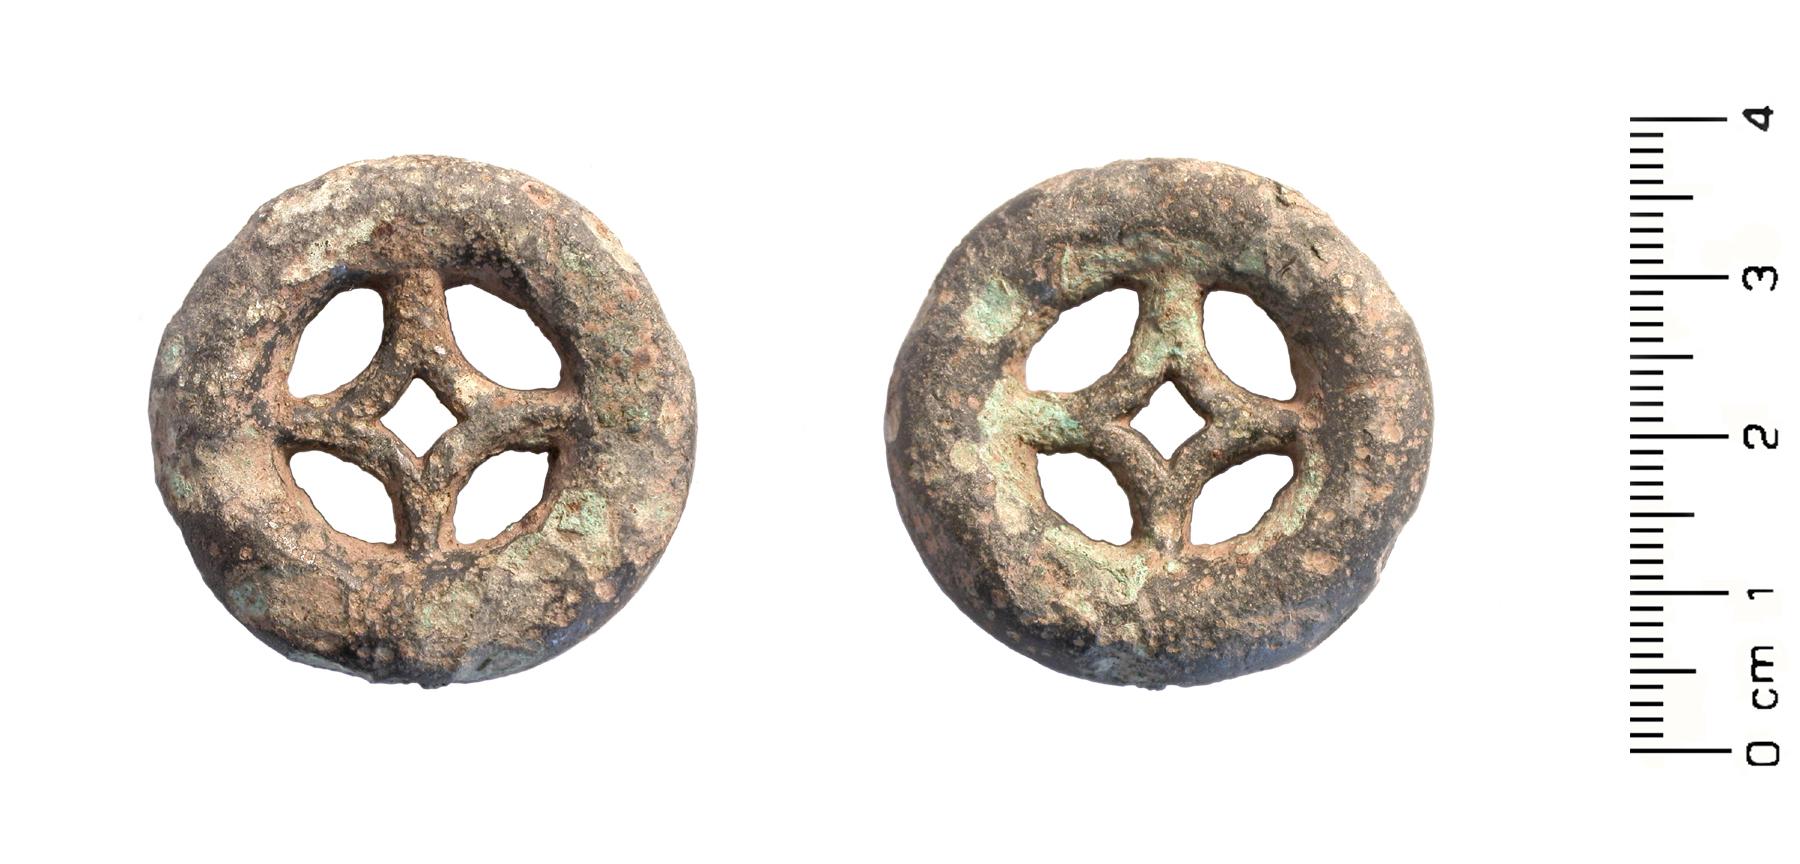 Filelate Bronze Age Early Iron Age Miniature Wheel Votive Model